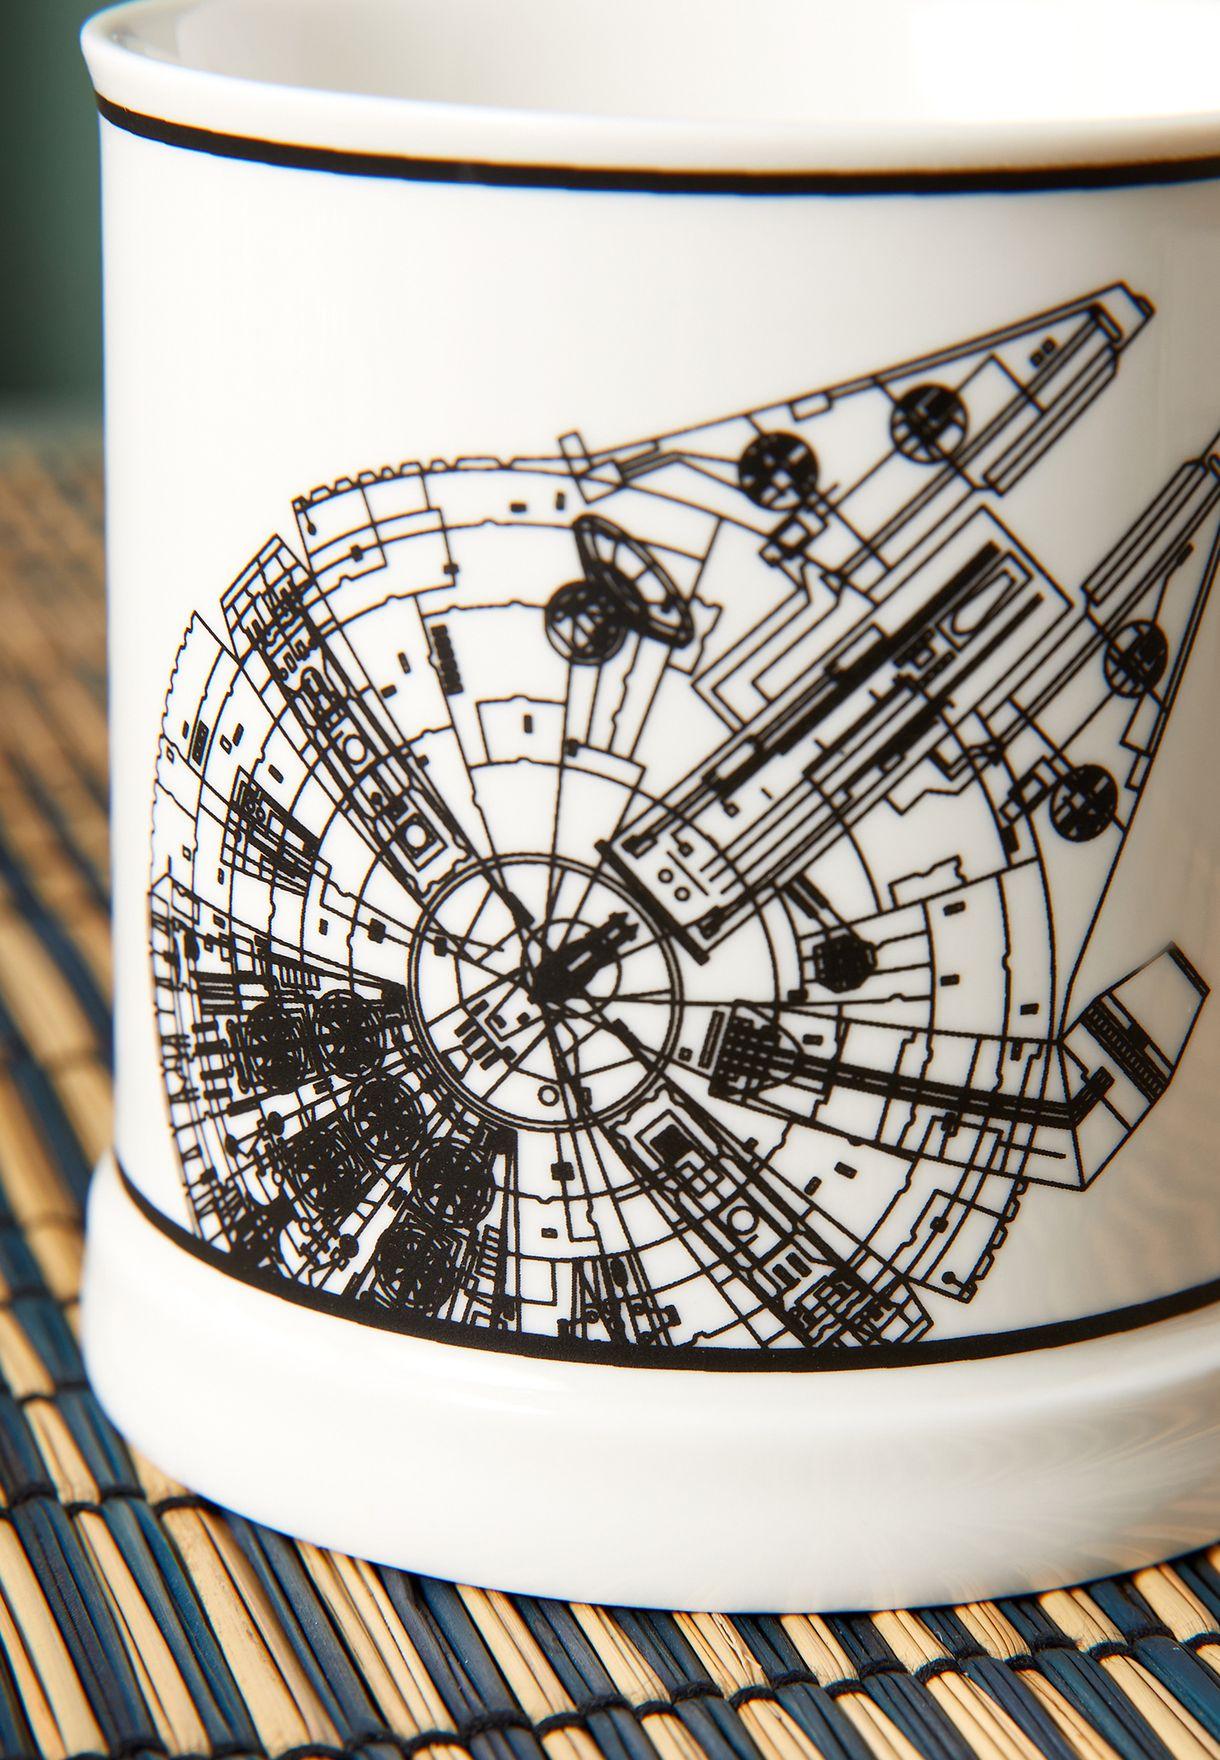 Star Wars Millenium Falcon Vintage Mug